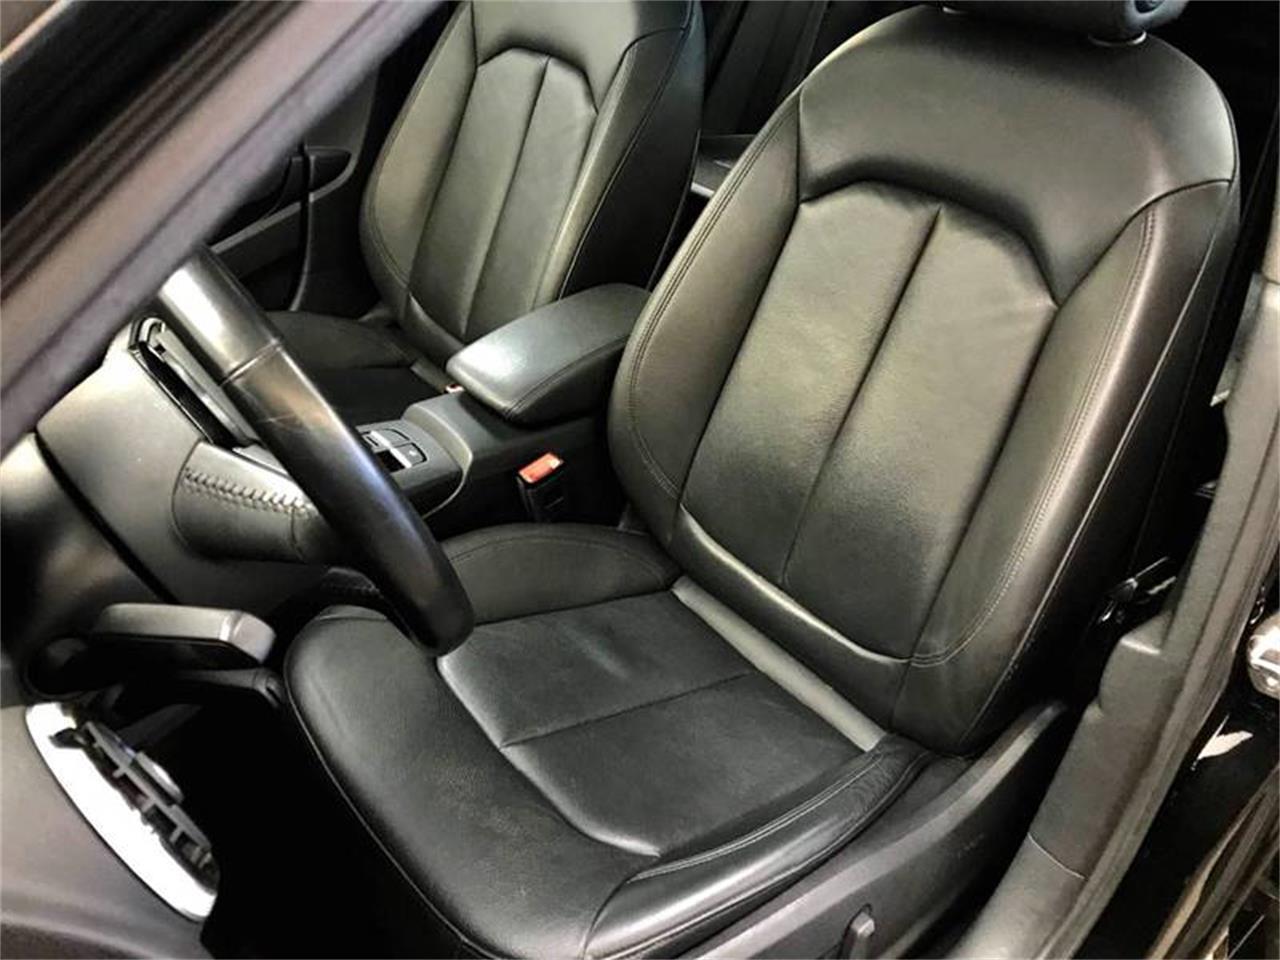 2016 Audi A3 (CC-1208674) for sale in Allison Park, Pennsylvania